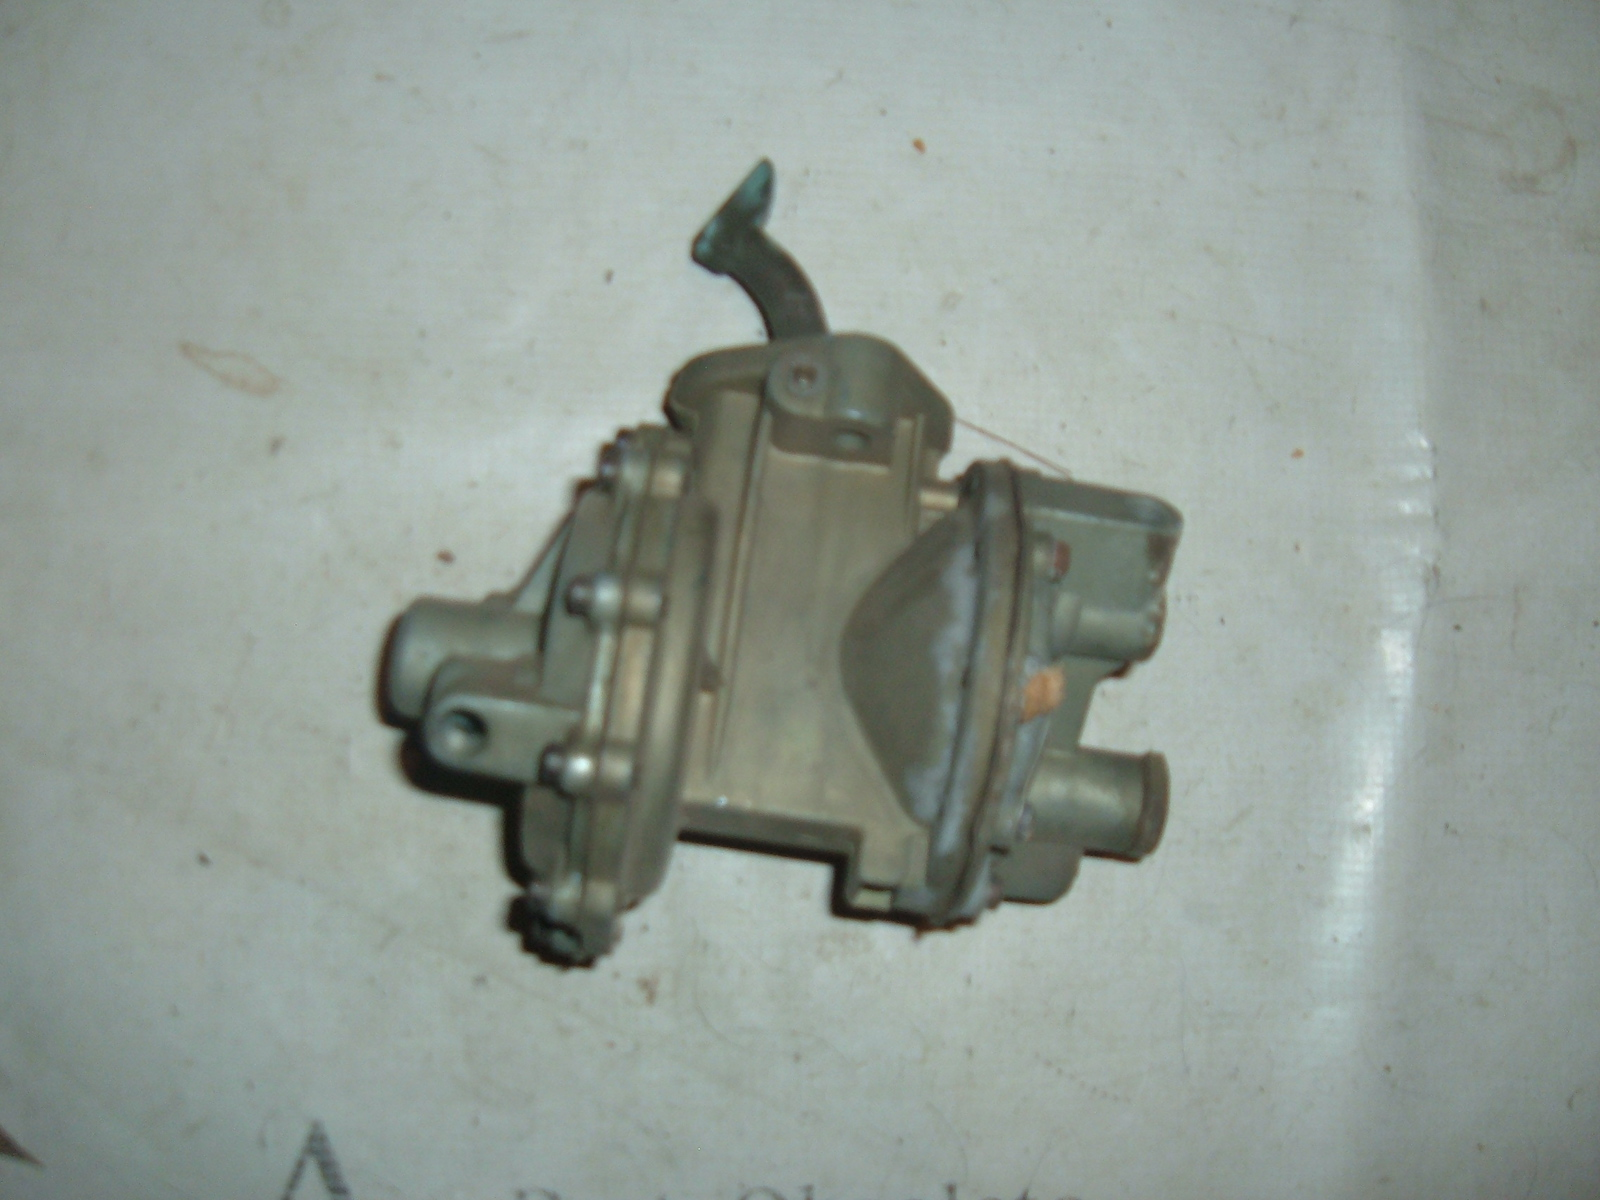 Parts For Rambler Nash Amc Ignition Circuit Diagram The 1955 8 Cylinder Ambassador Fuel Pump 4301 Z